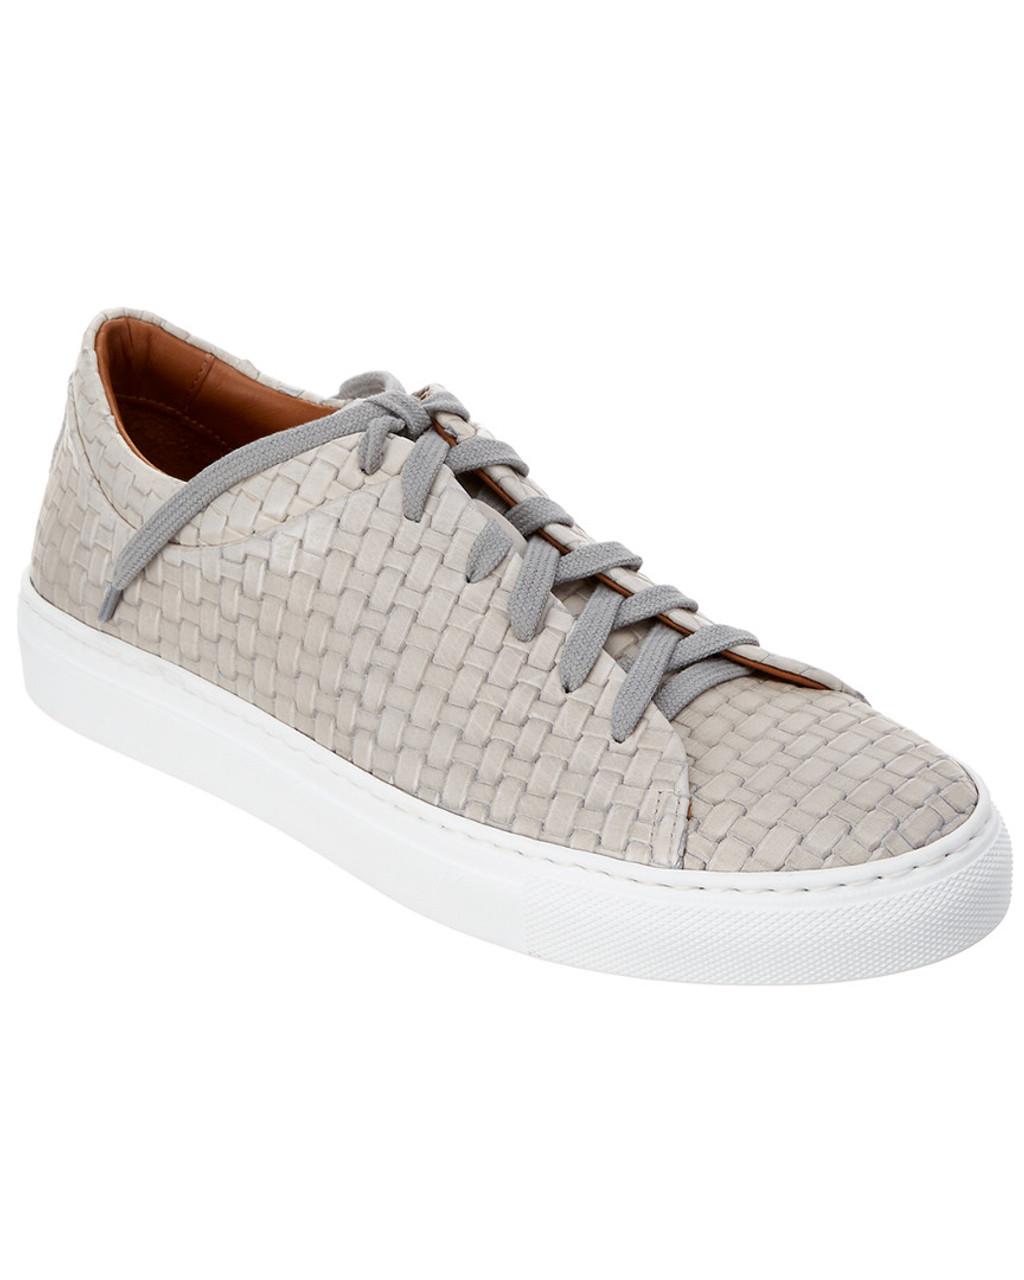 07844681c59 Aquatalia Avery Waterproof Embossed-Leather Sneaker~1311751554 - Carsons